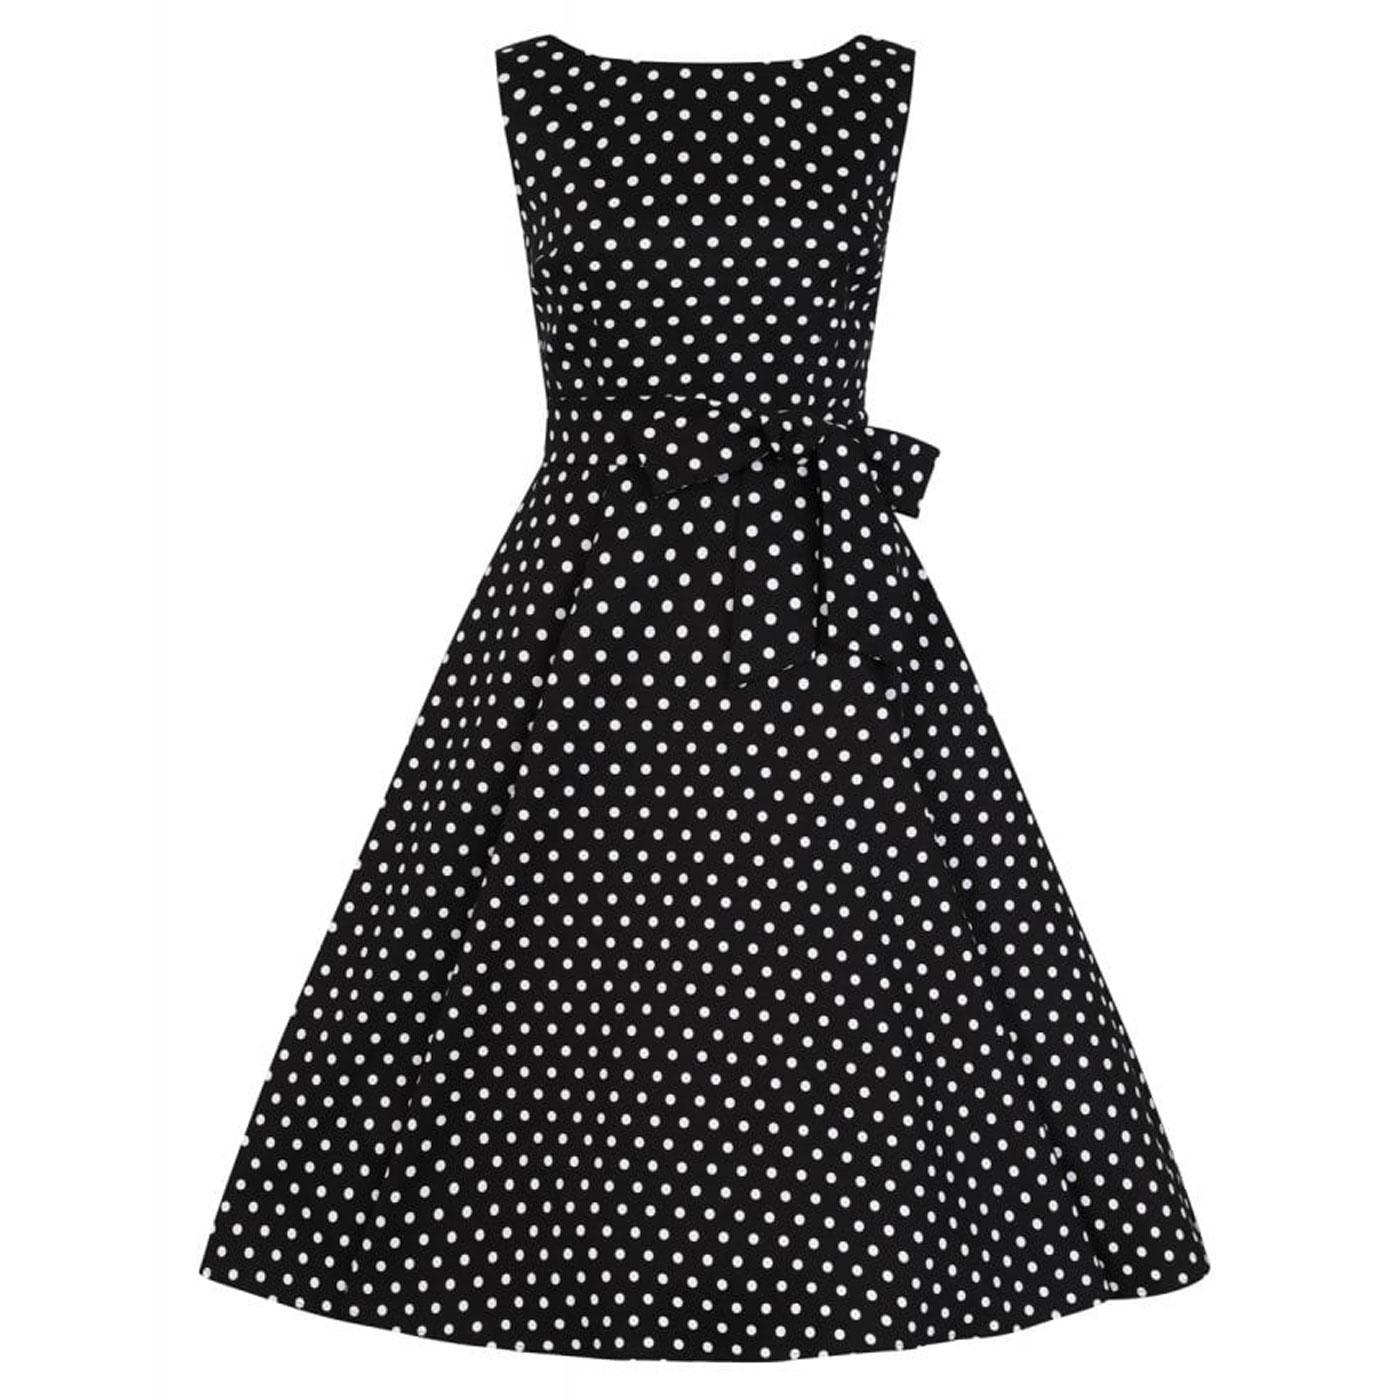 Frances COLLECTIF Retro 50s Polka Dot Swing Dress